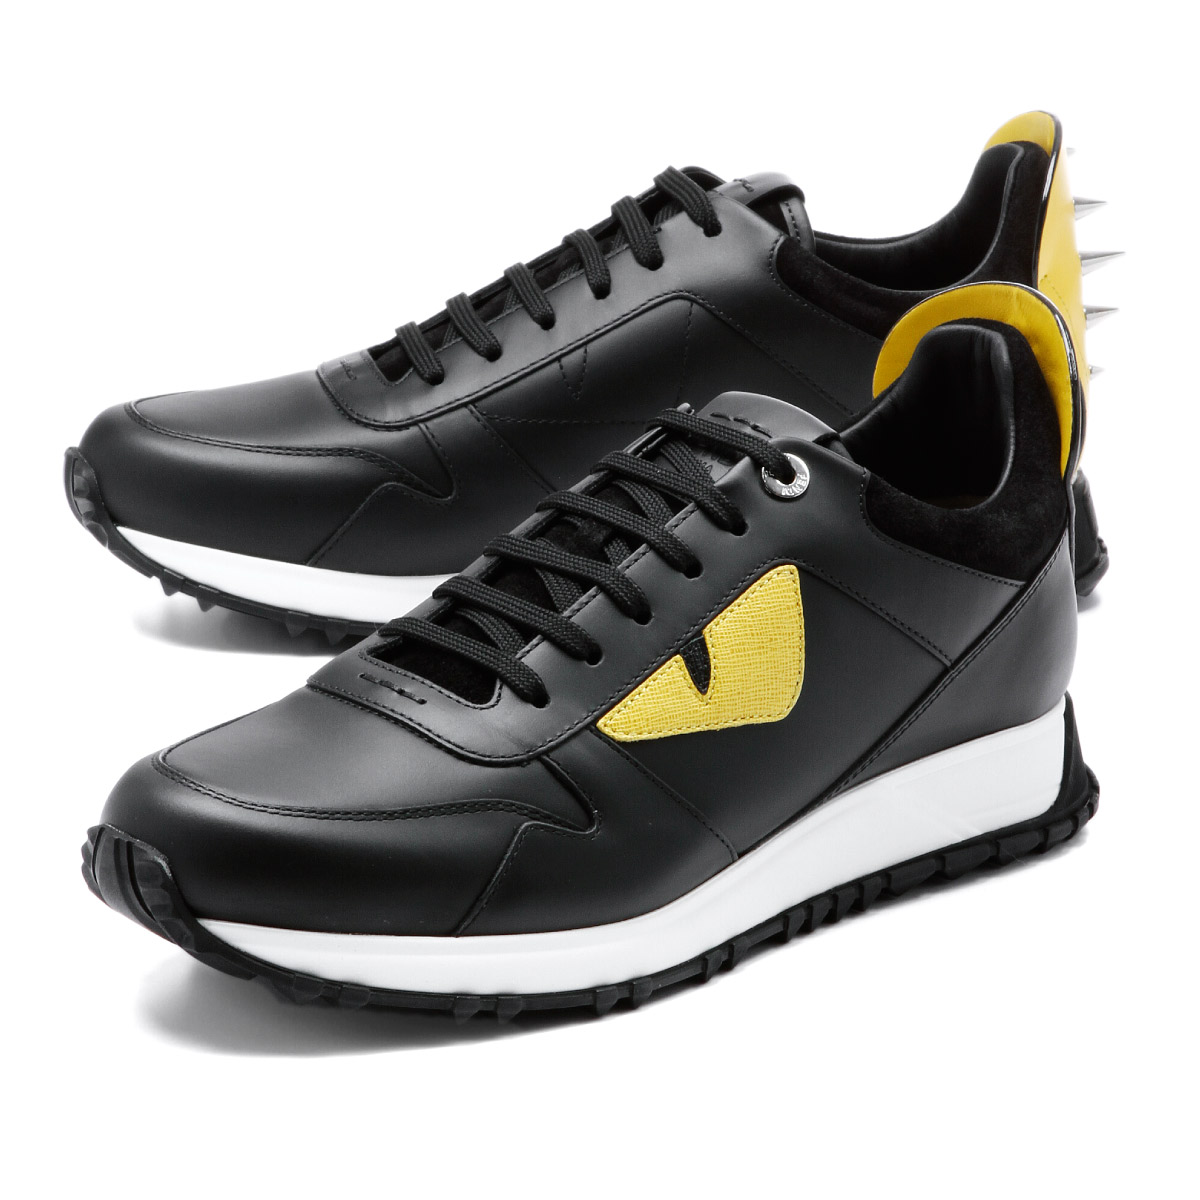 Official Website good texture save off Fendi FENDI shoes men 7E0935 4R6 F046W sneakers NE+G.FENDI+GIAL+NE+N black  / yellow